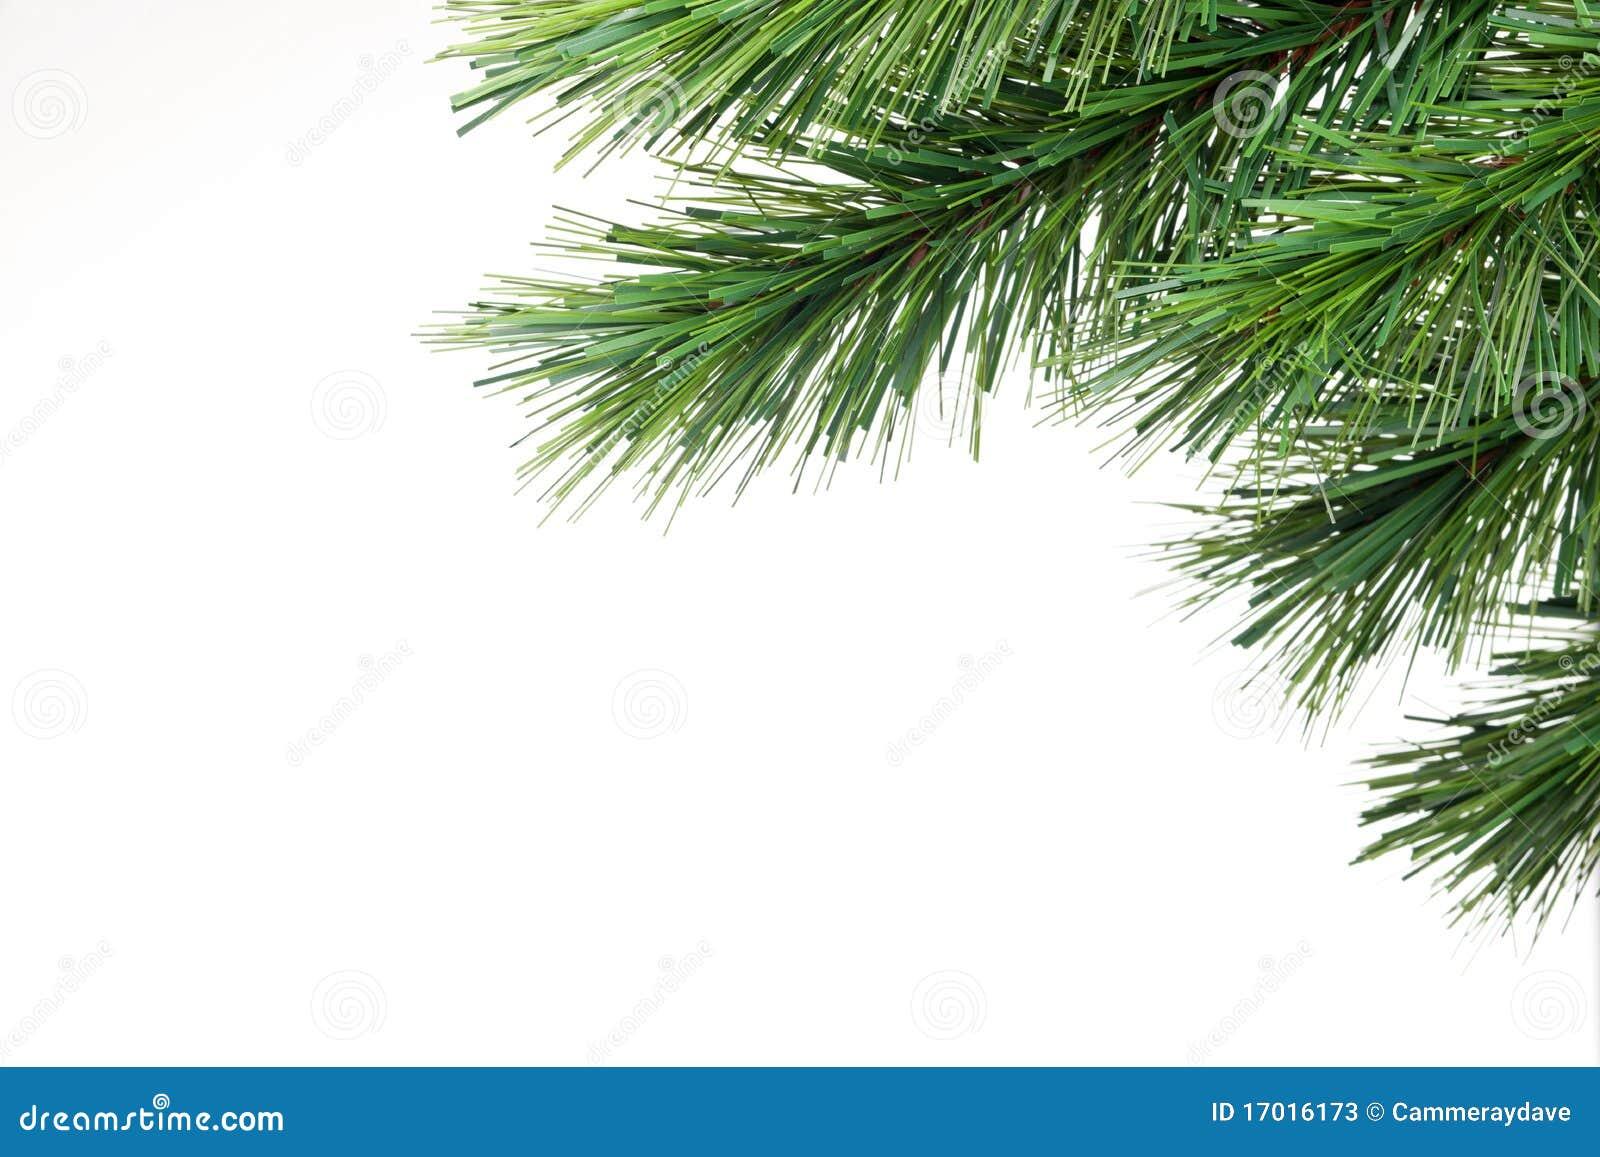 Christmas Tree Branch Background Stock Photos - Image: 17016173